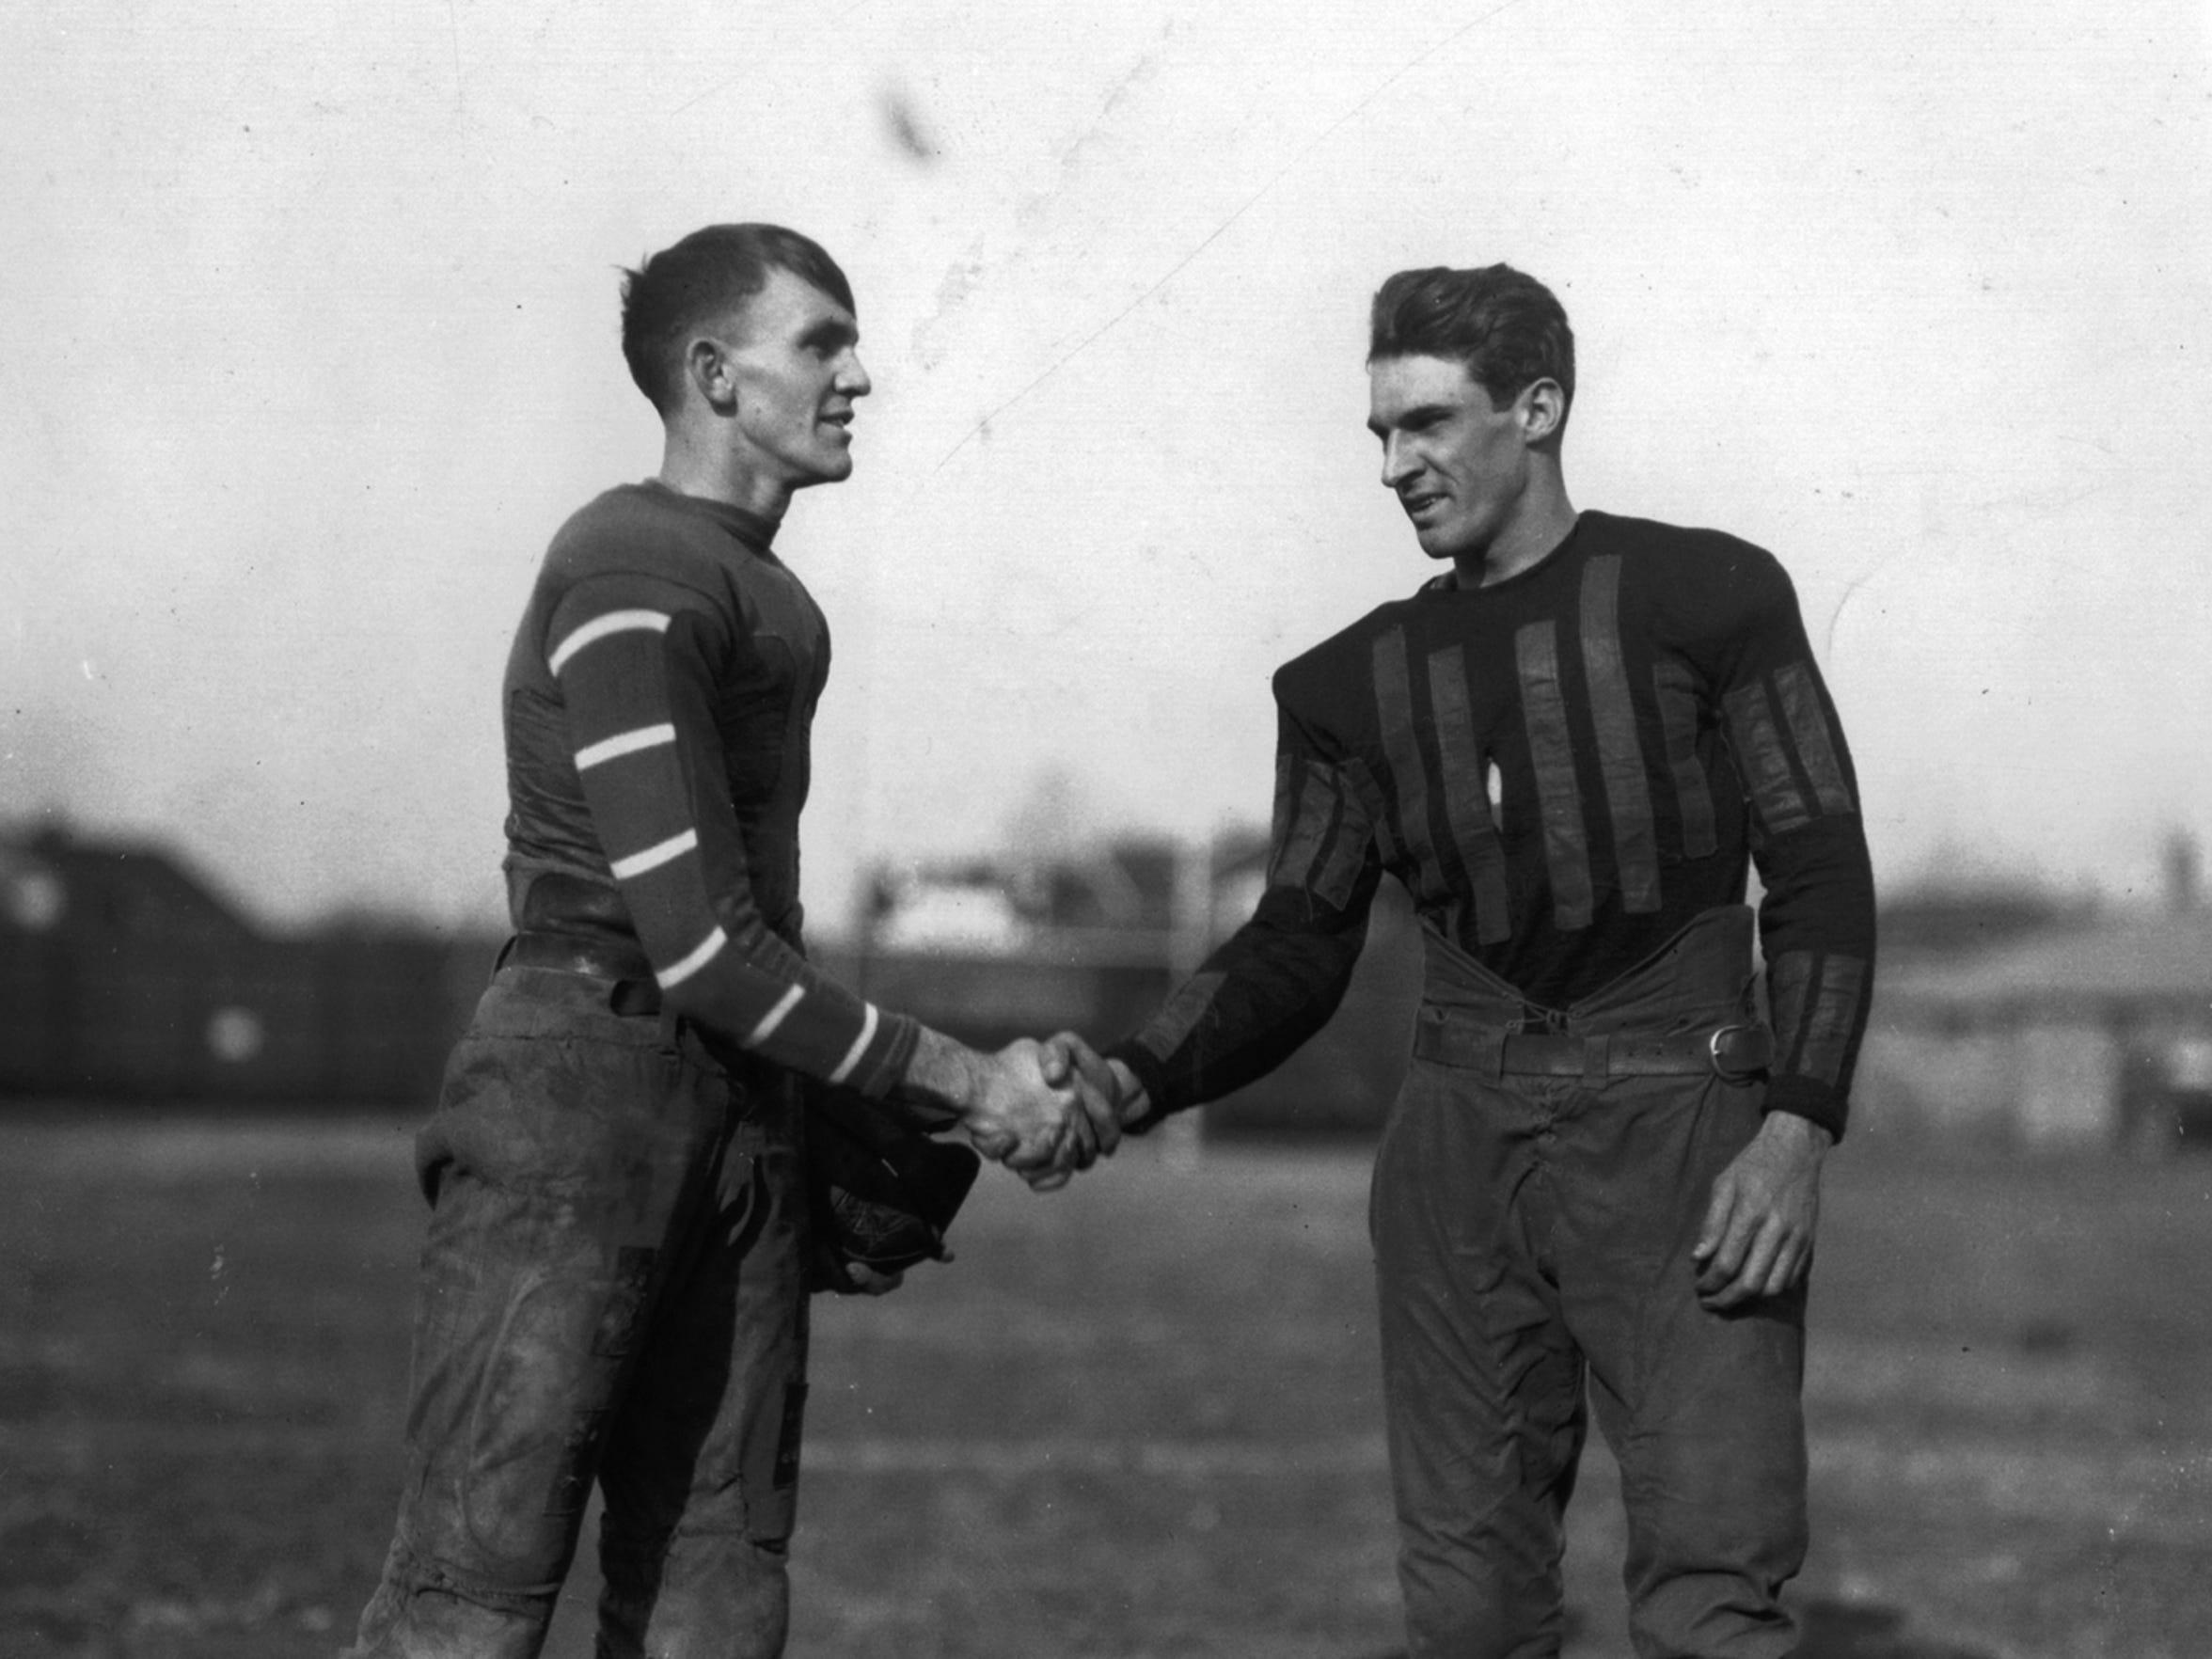 Vanderbilt quarterback Jess Neely, right, played with